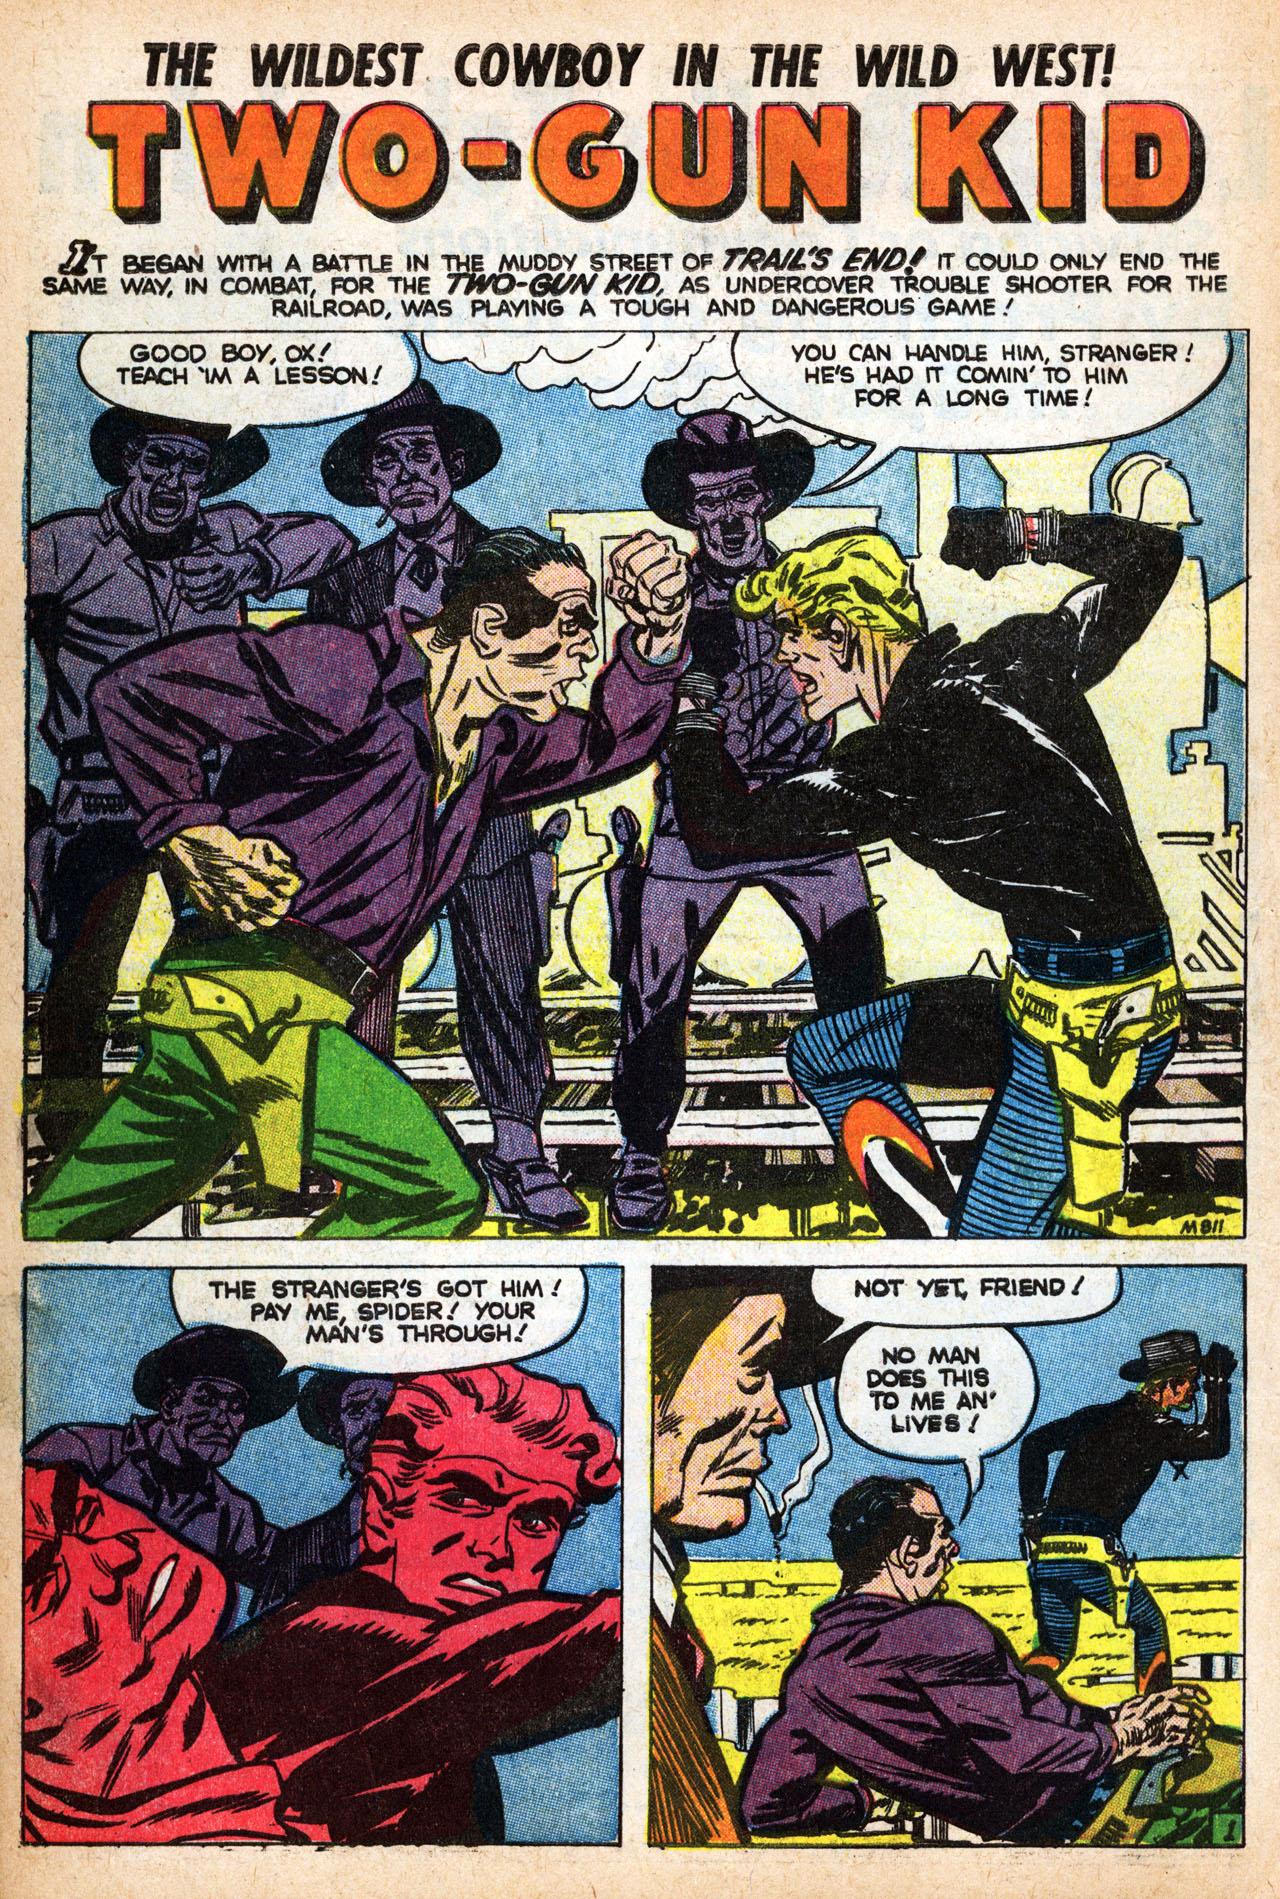 Read online Two-Gun Kid comic -  Issue #39 - 10